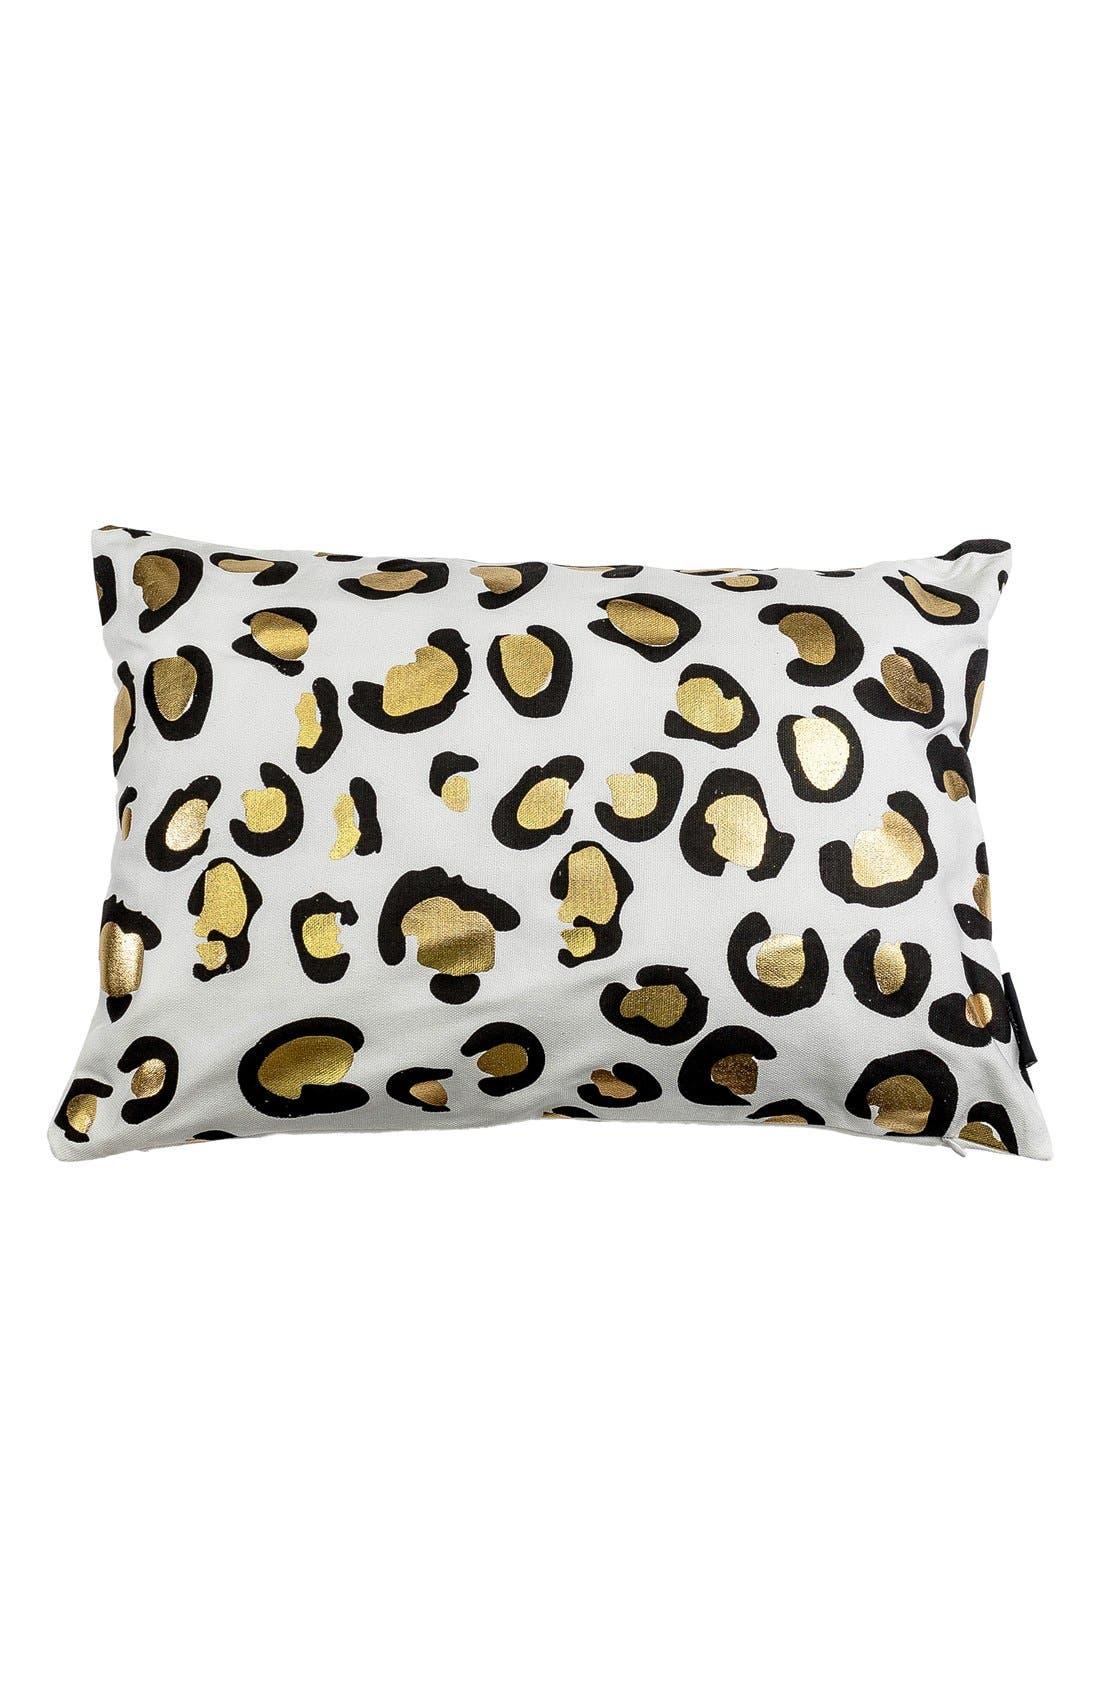 Metallic Animal Print Pillow,                         Main,                         color, White/ Gold Multi